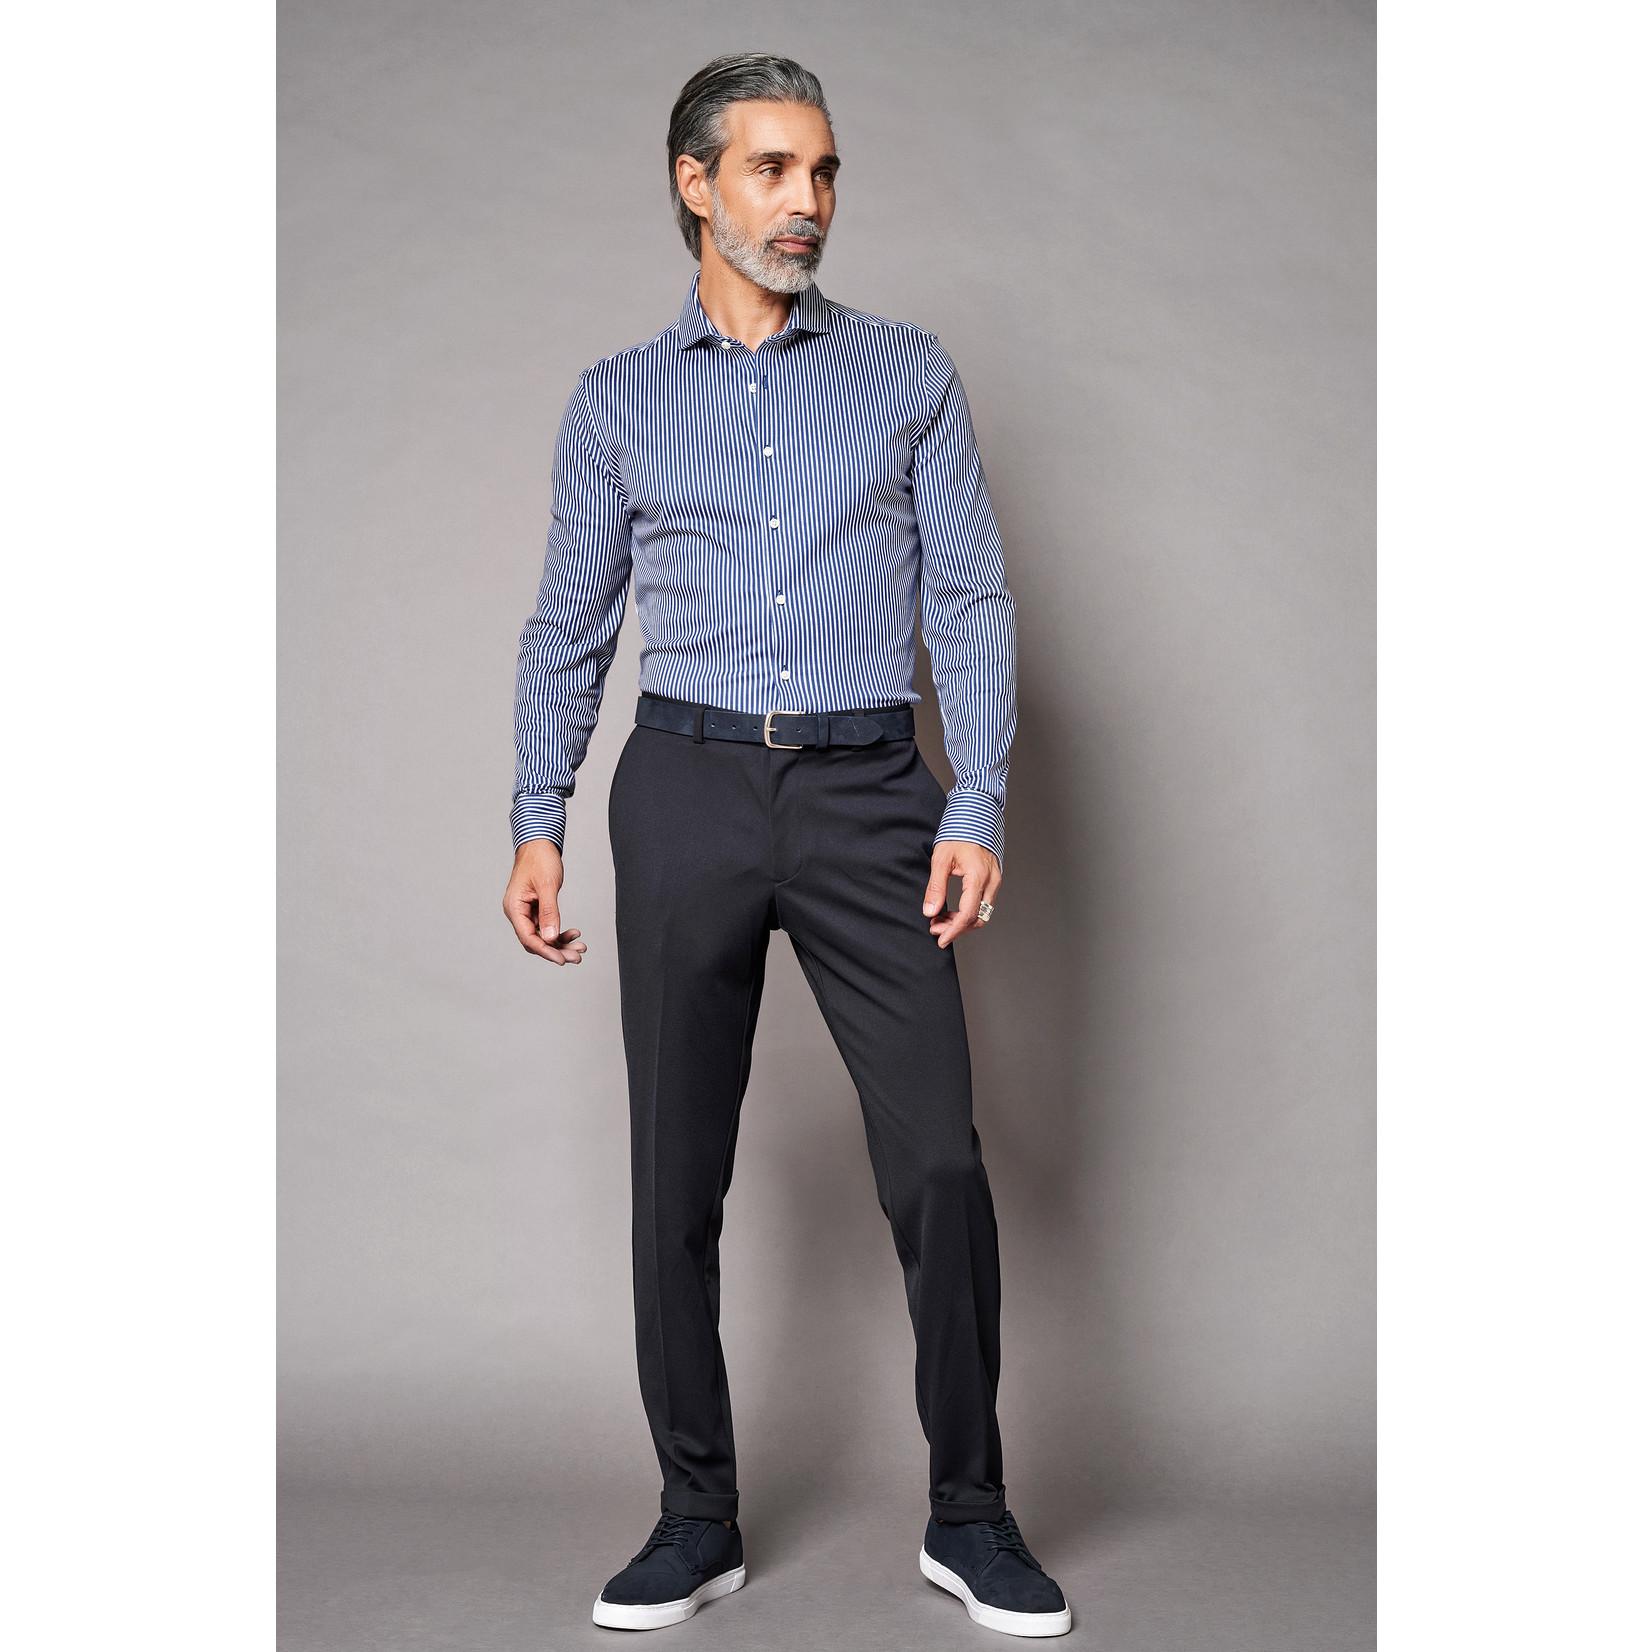 Desoto Luxury jersey overhemd blauw streep